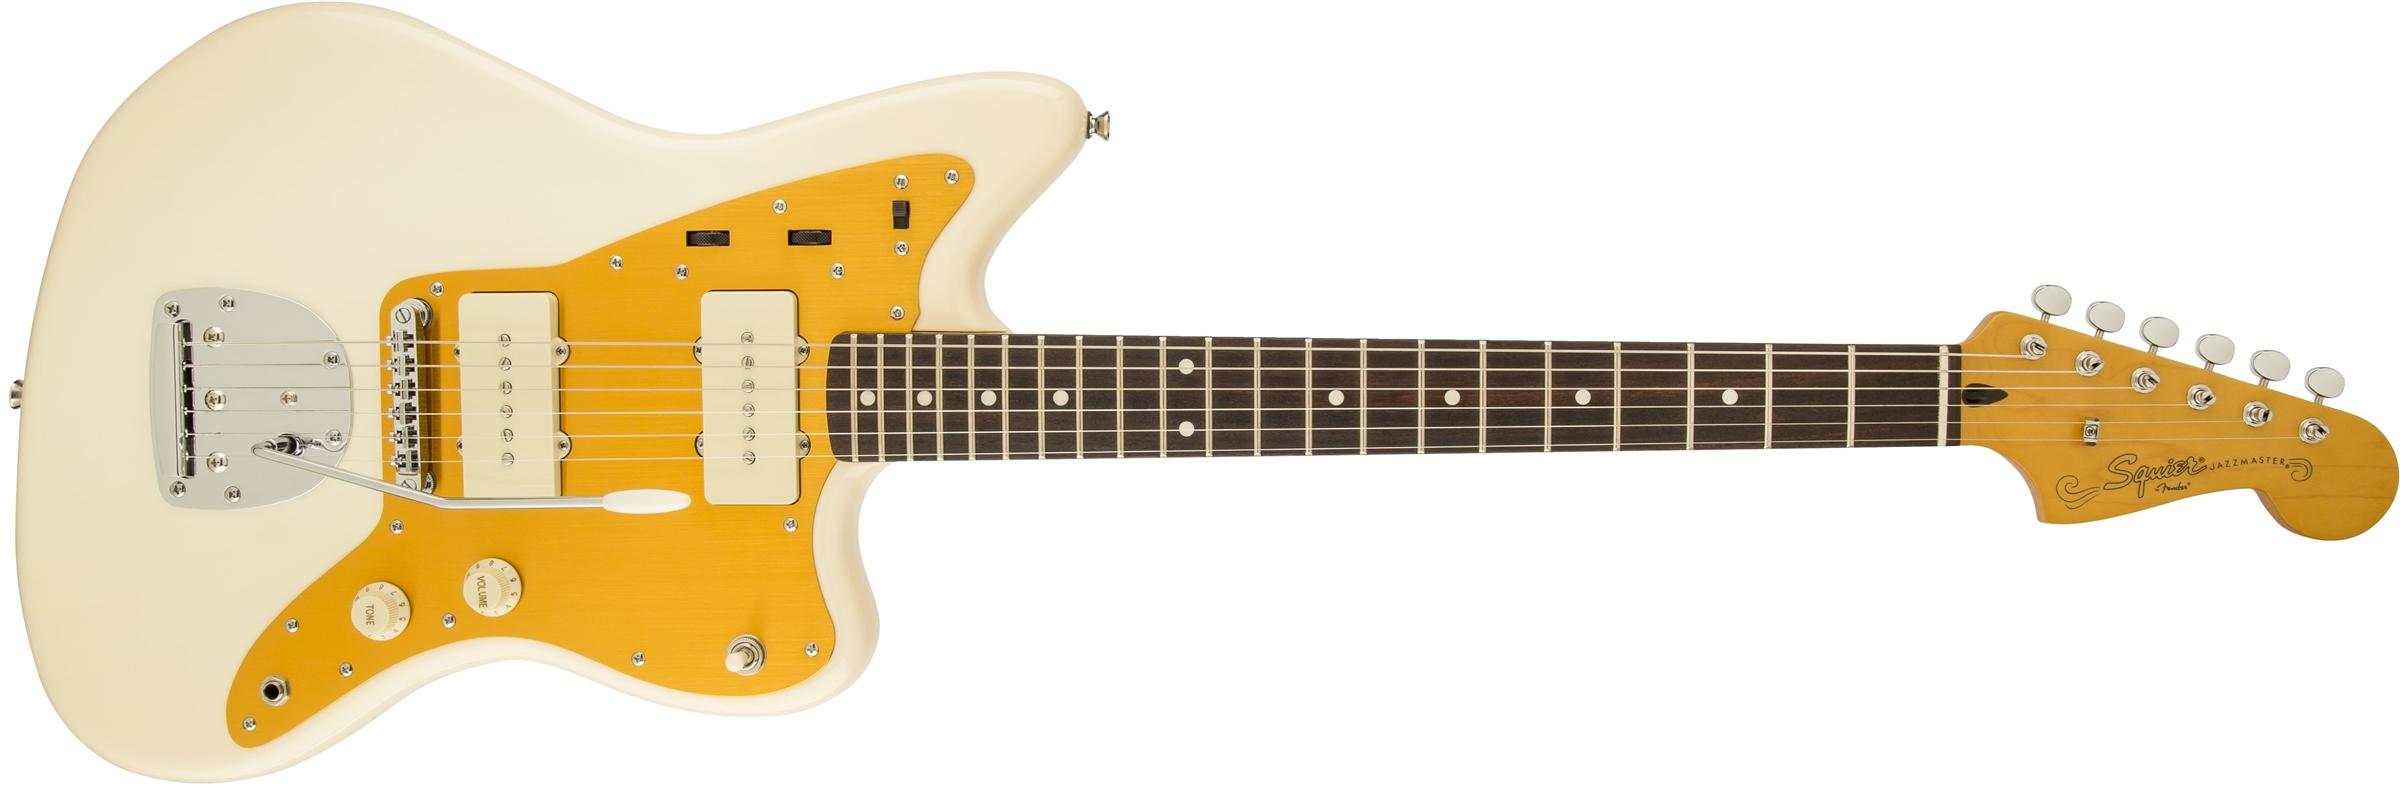 squier� j mascis jazzmaster� squier electric guitars Fender Jaguar HH Wiring-Diagram Fender Jaguar Parts List mascis jazzmaster wiring diagram